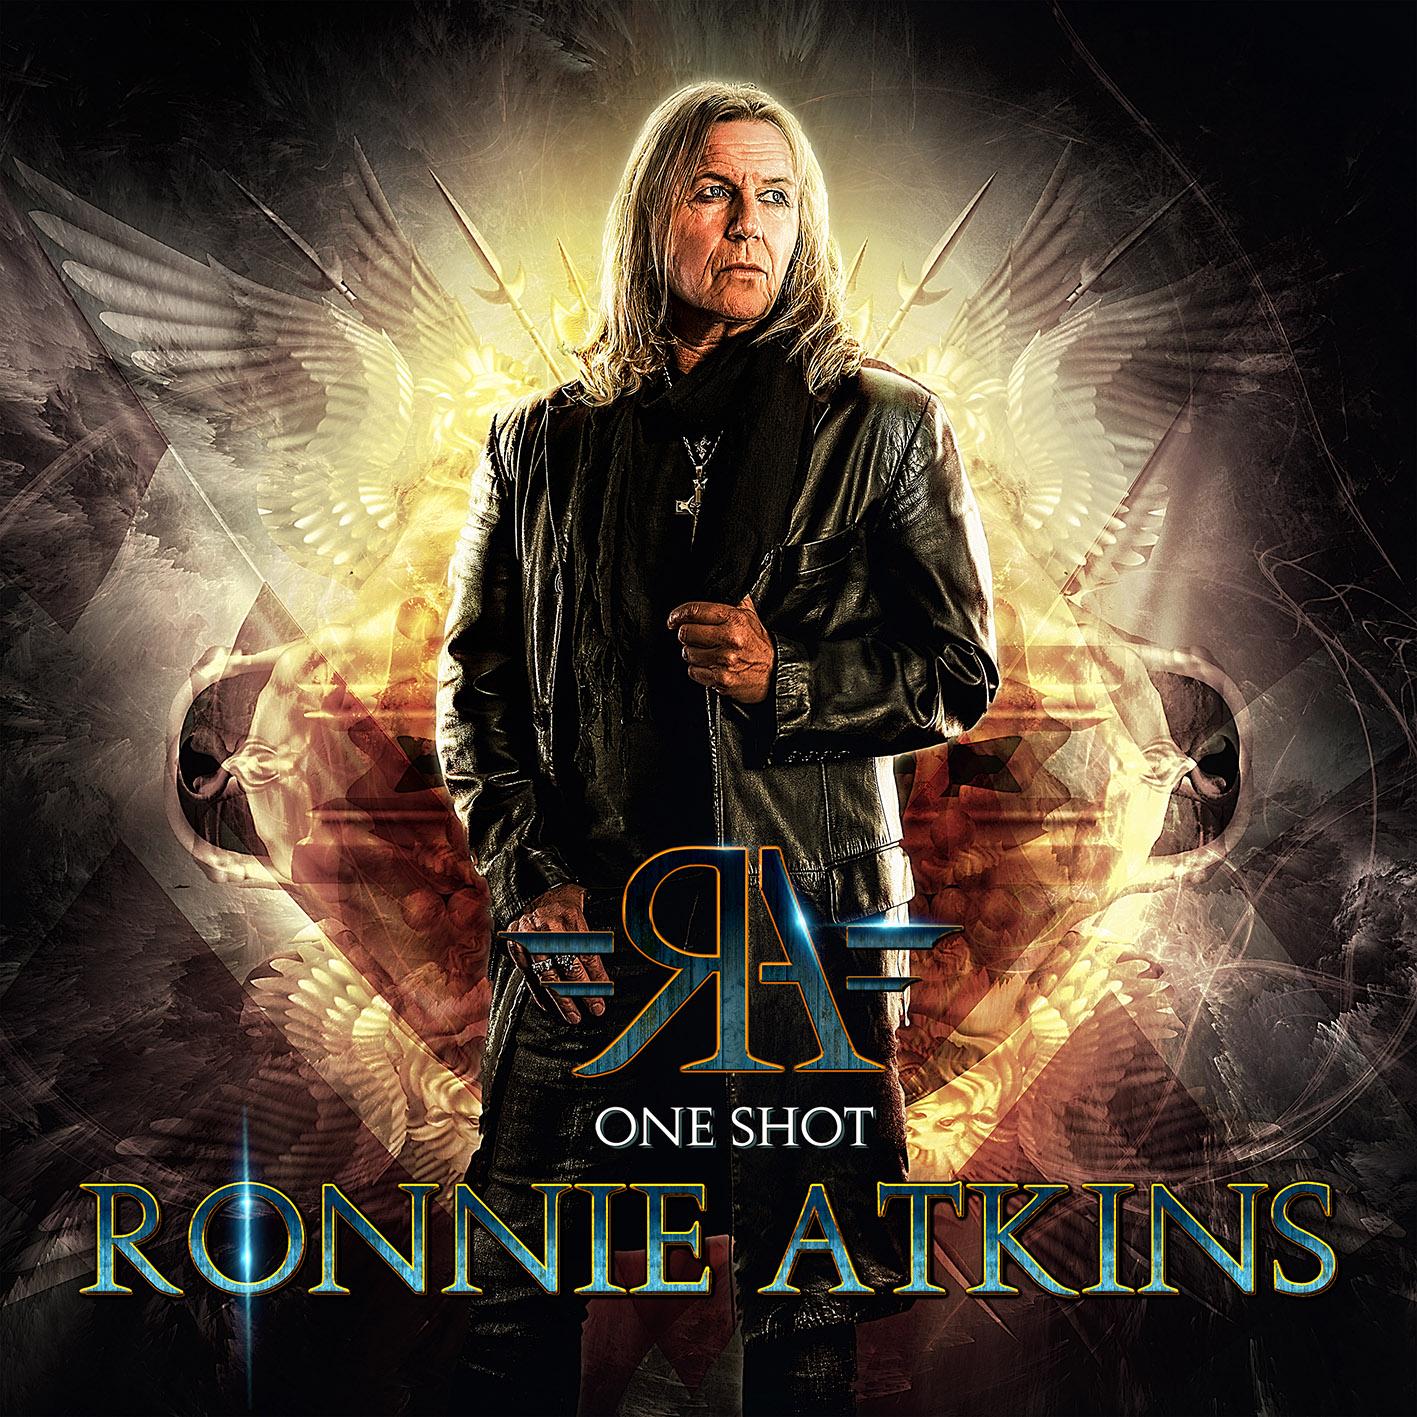 ronnie-atkins-solo-debut-one-shot-des-pretty-maids-frontmanns-album-review